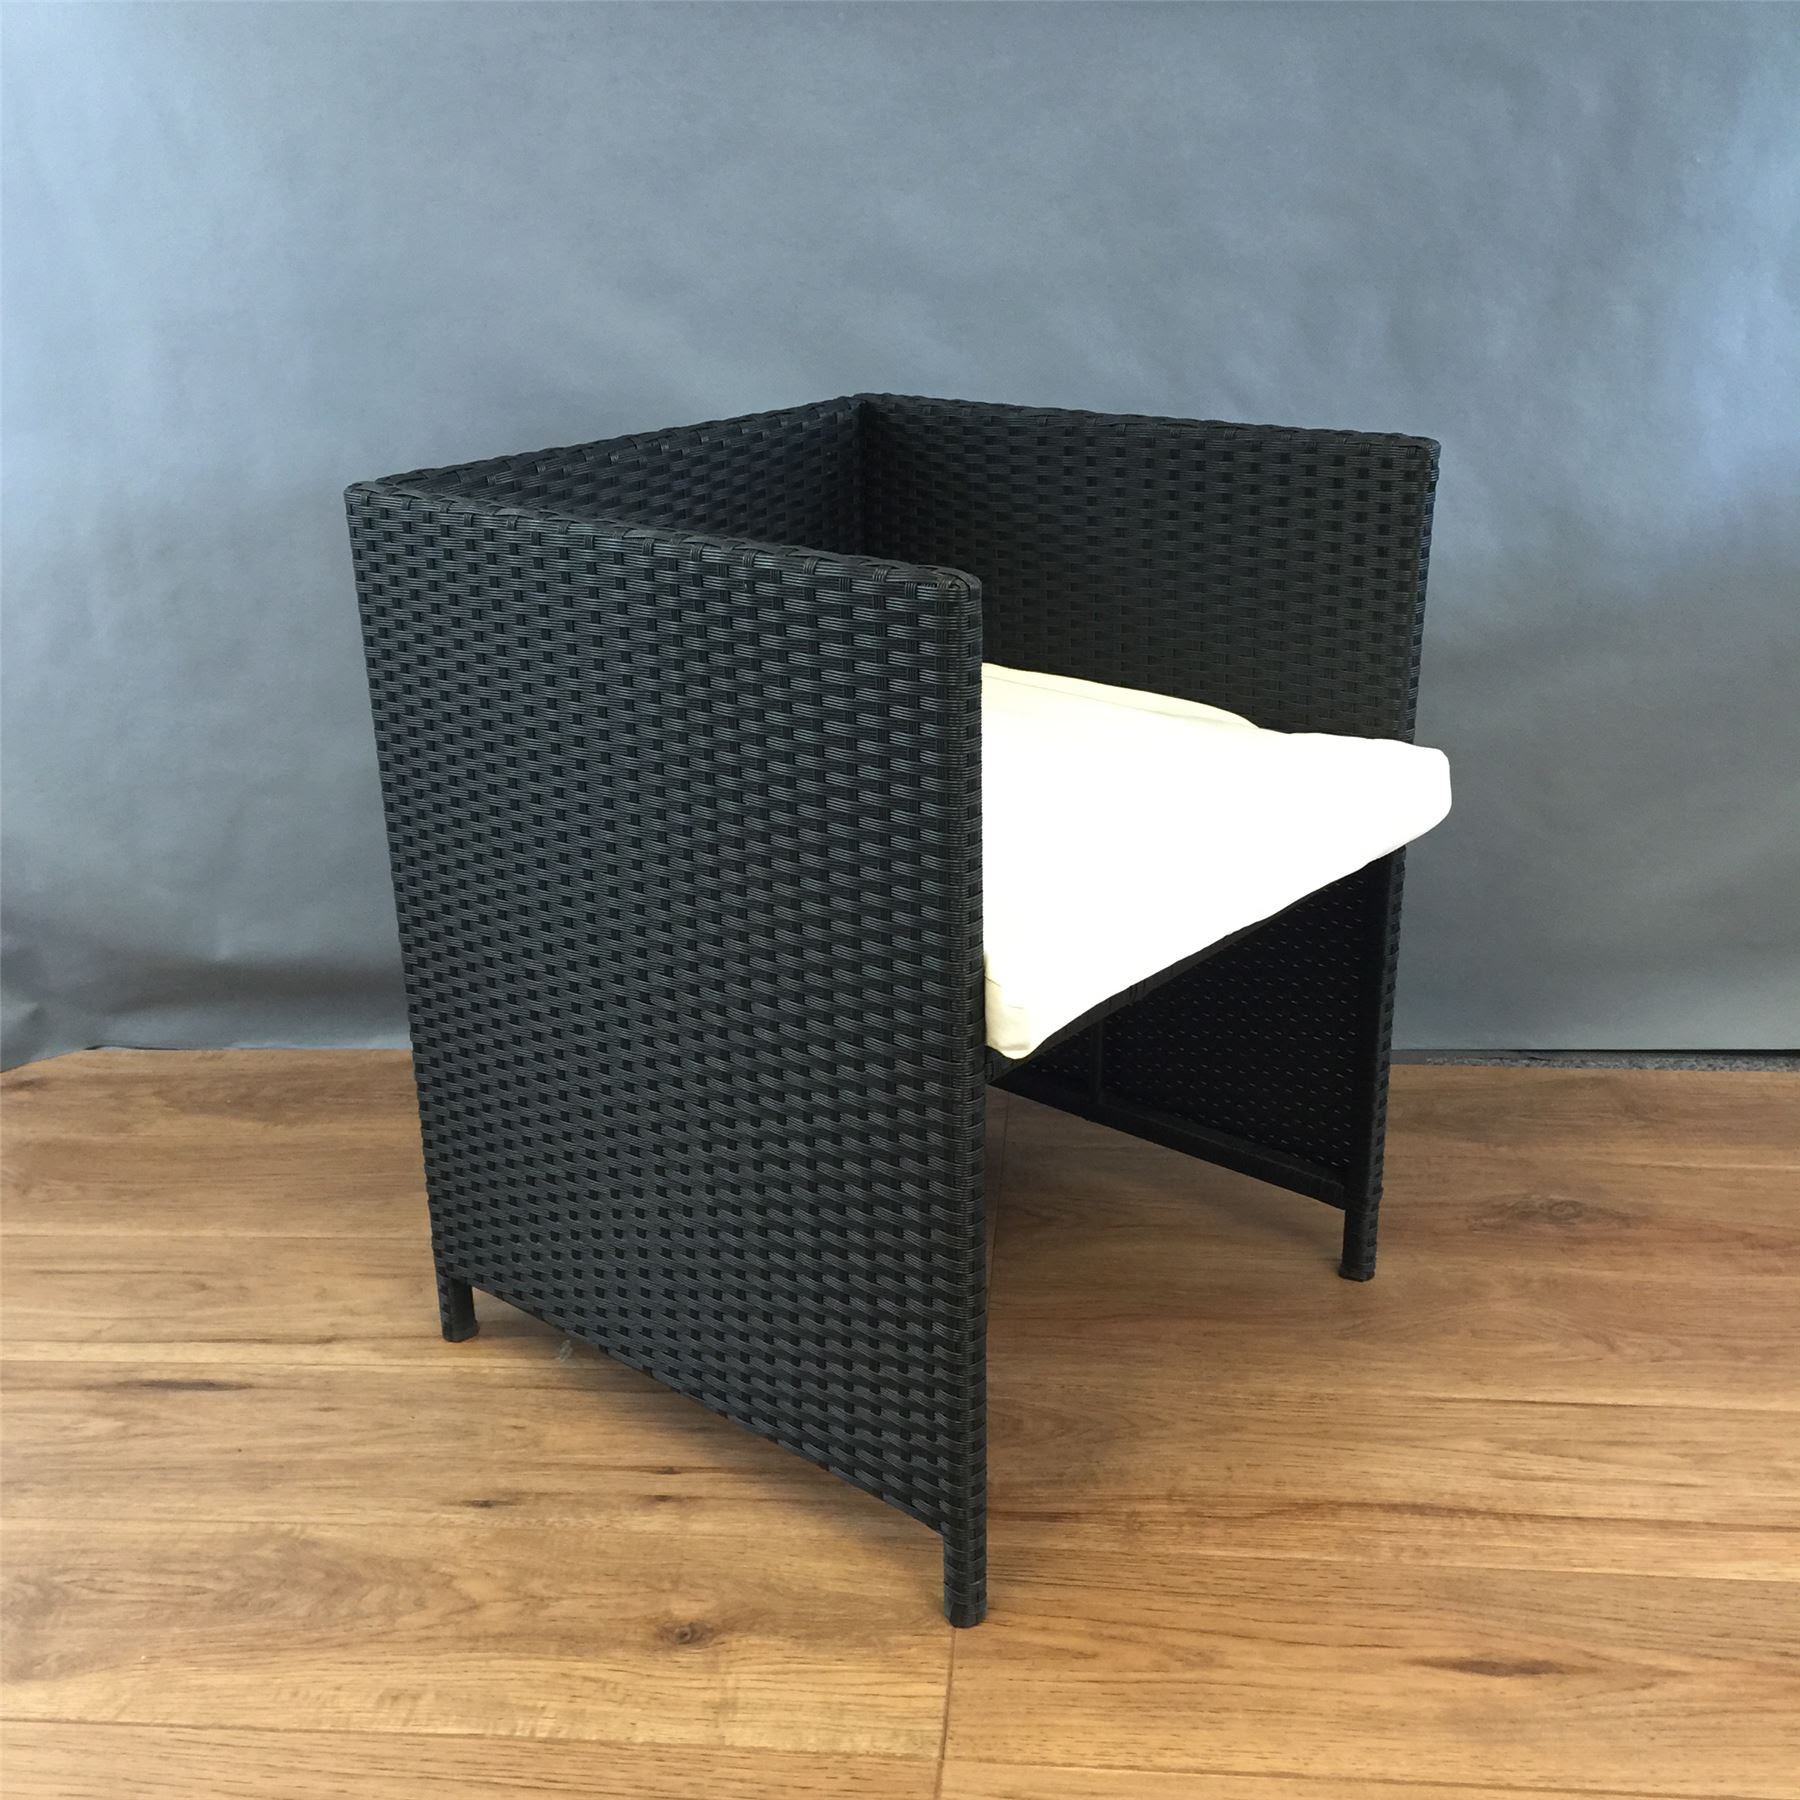 Rattan Furniture Table Foot Stood Chair Patio Garden ...